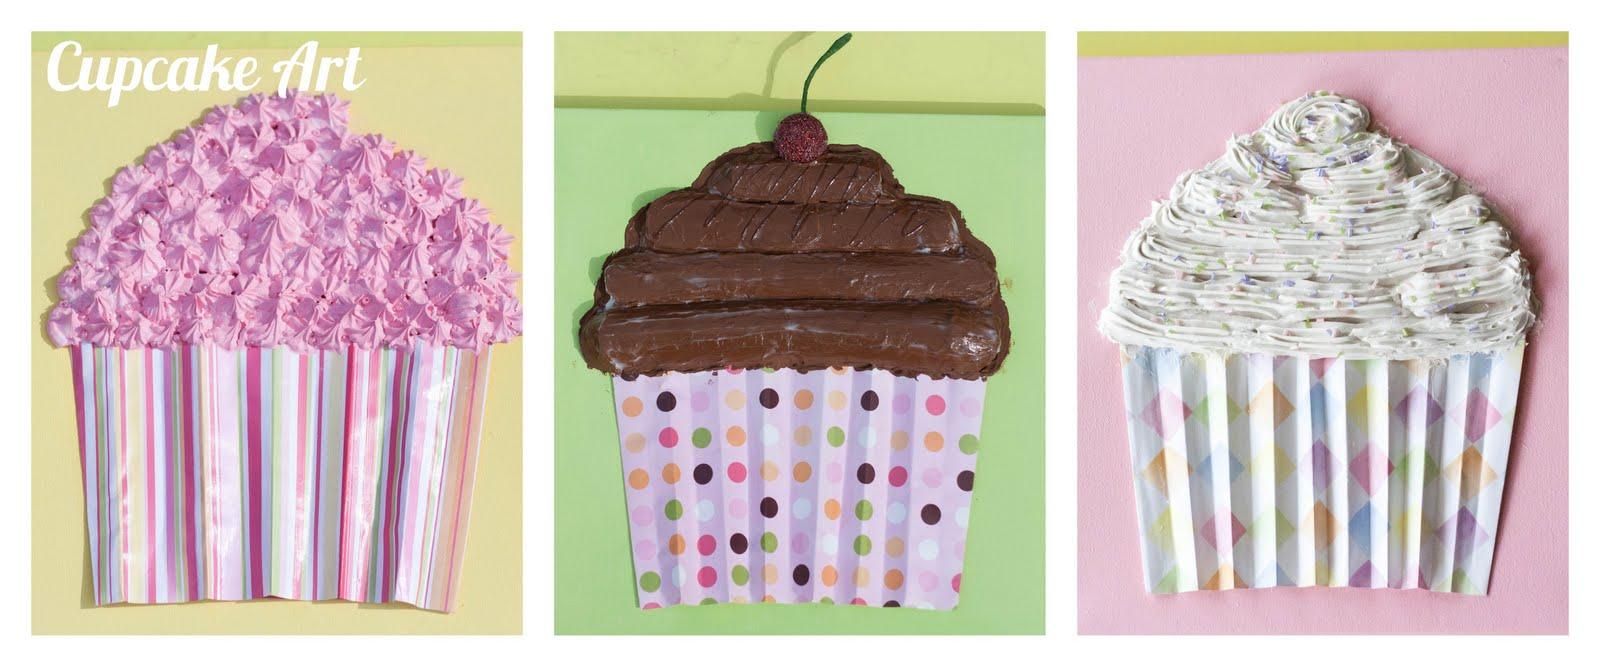 Cupcake Wall Art - My Insanity